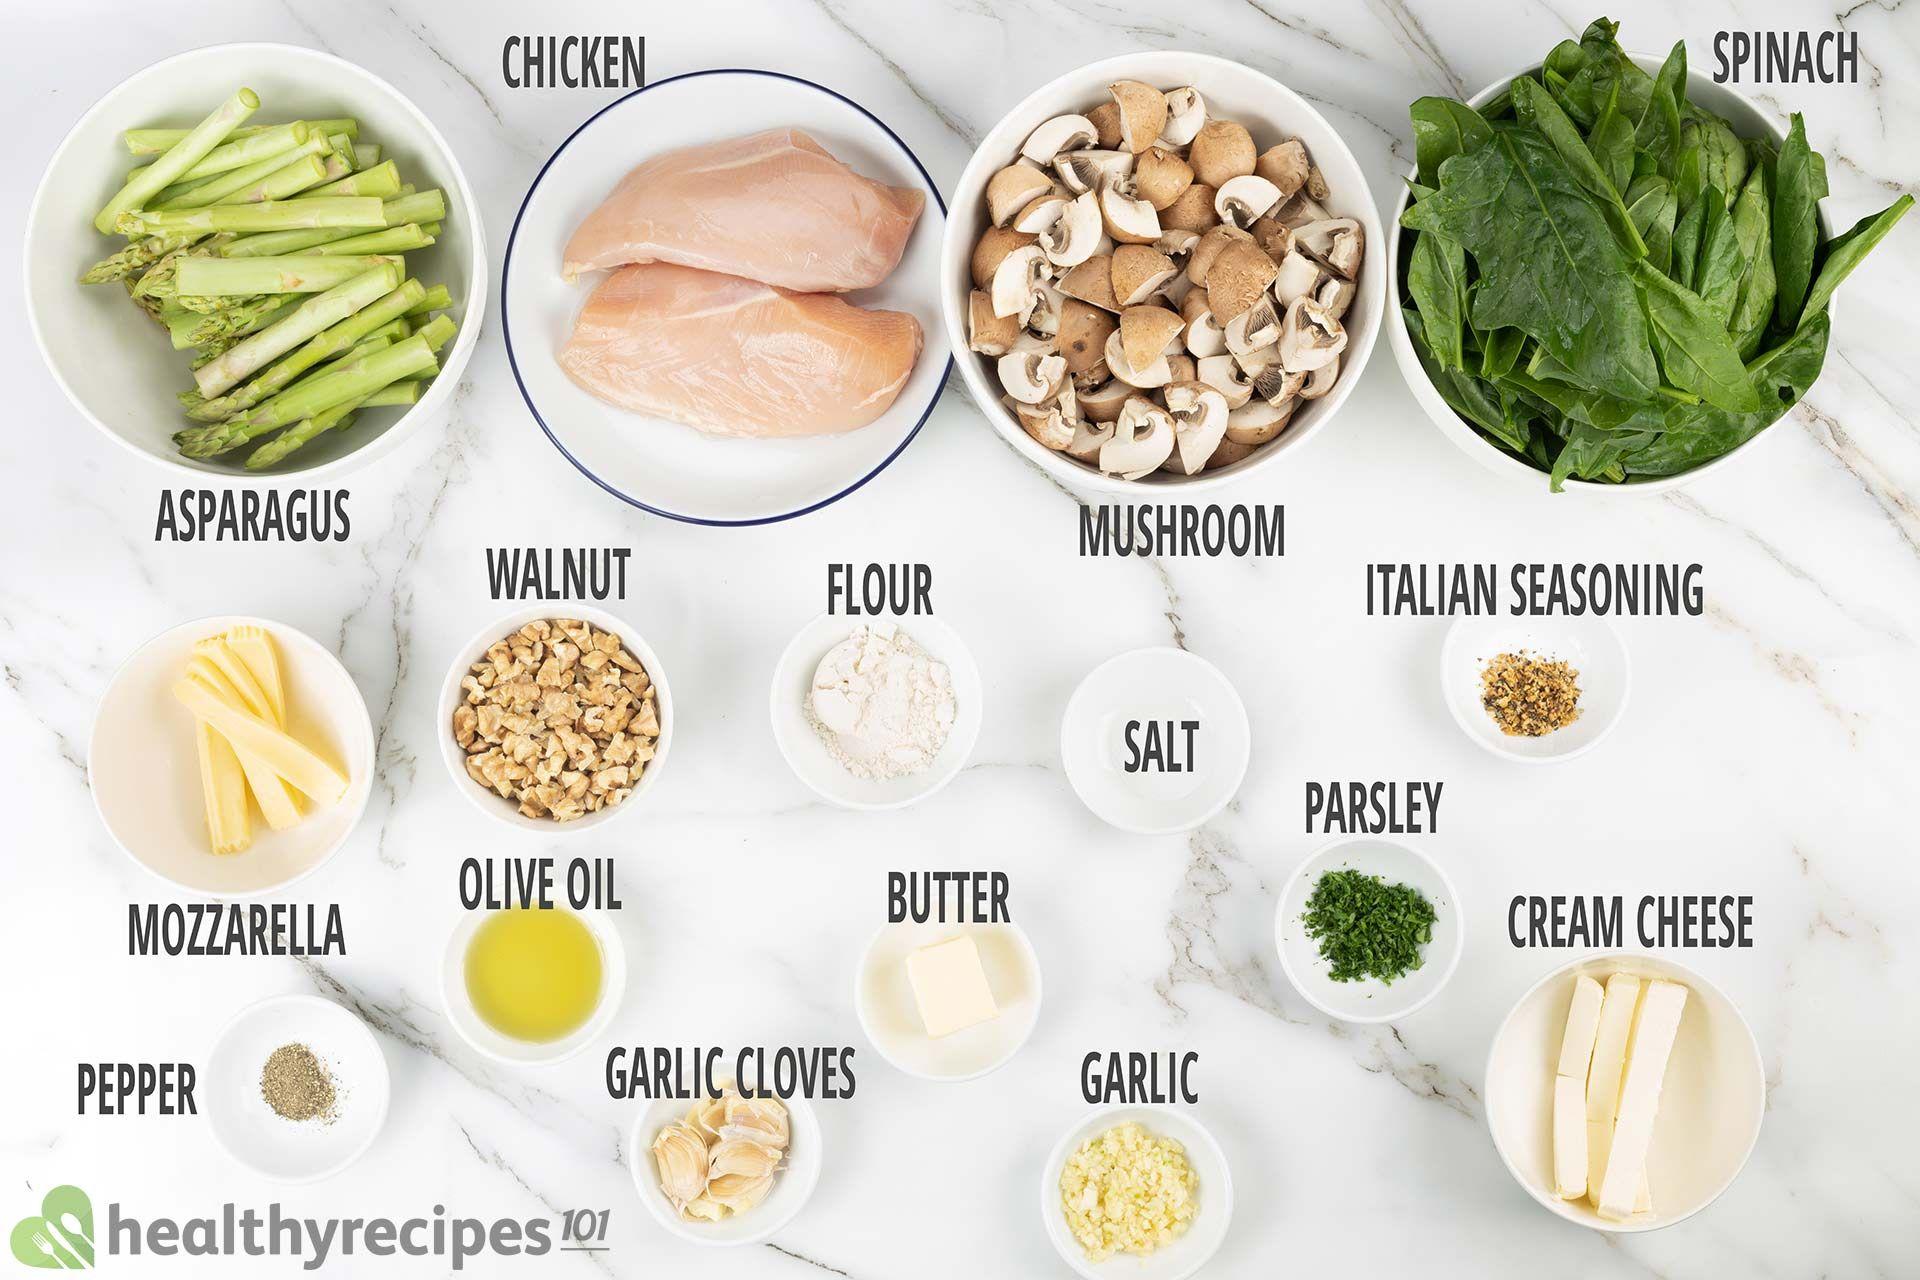 Stuffed Chicken Breast ingredients